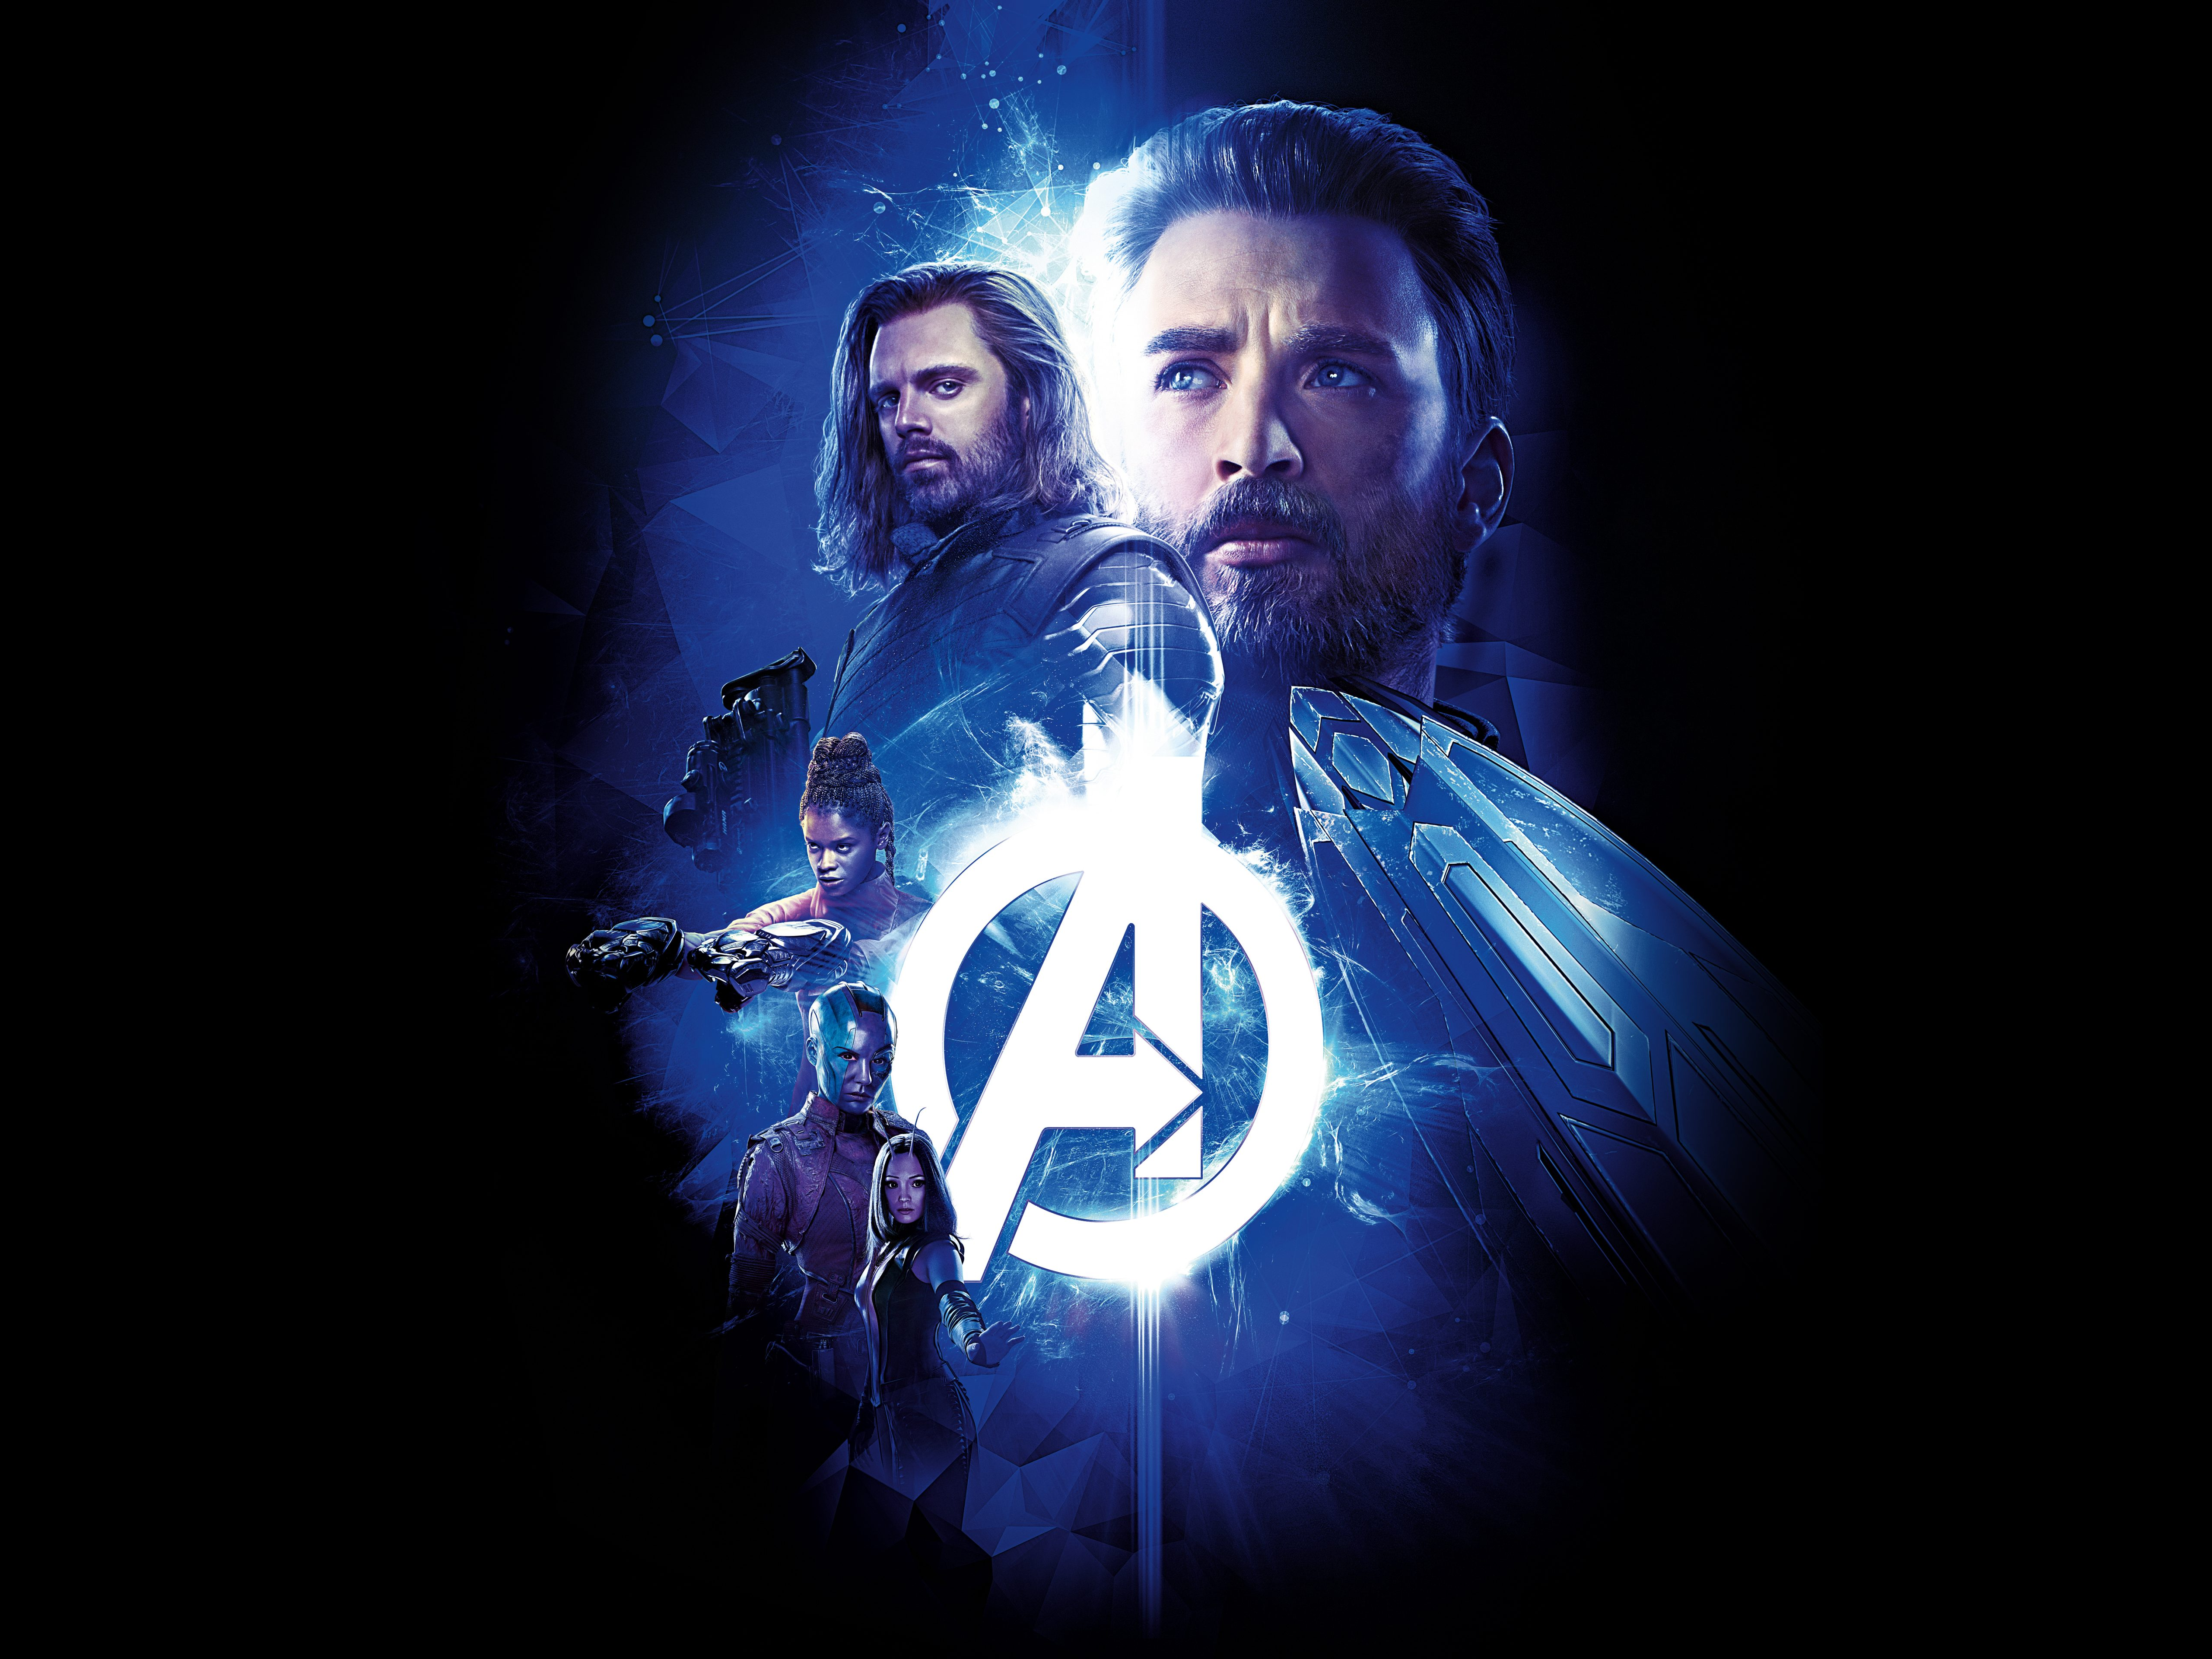 Avengers Infinity War 2018 Thanos 4k Uhd 3 2 3840x2560: Avengers: Infinity War (2018) Space Stone 8K Ultra HD